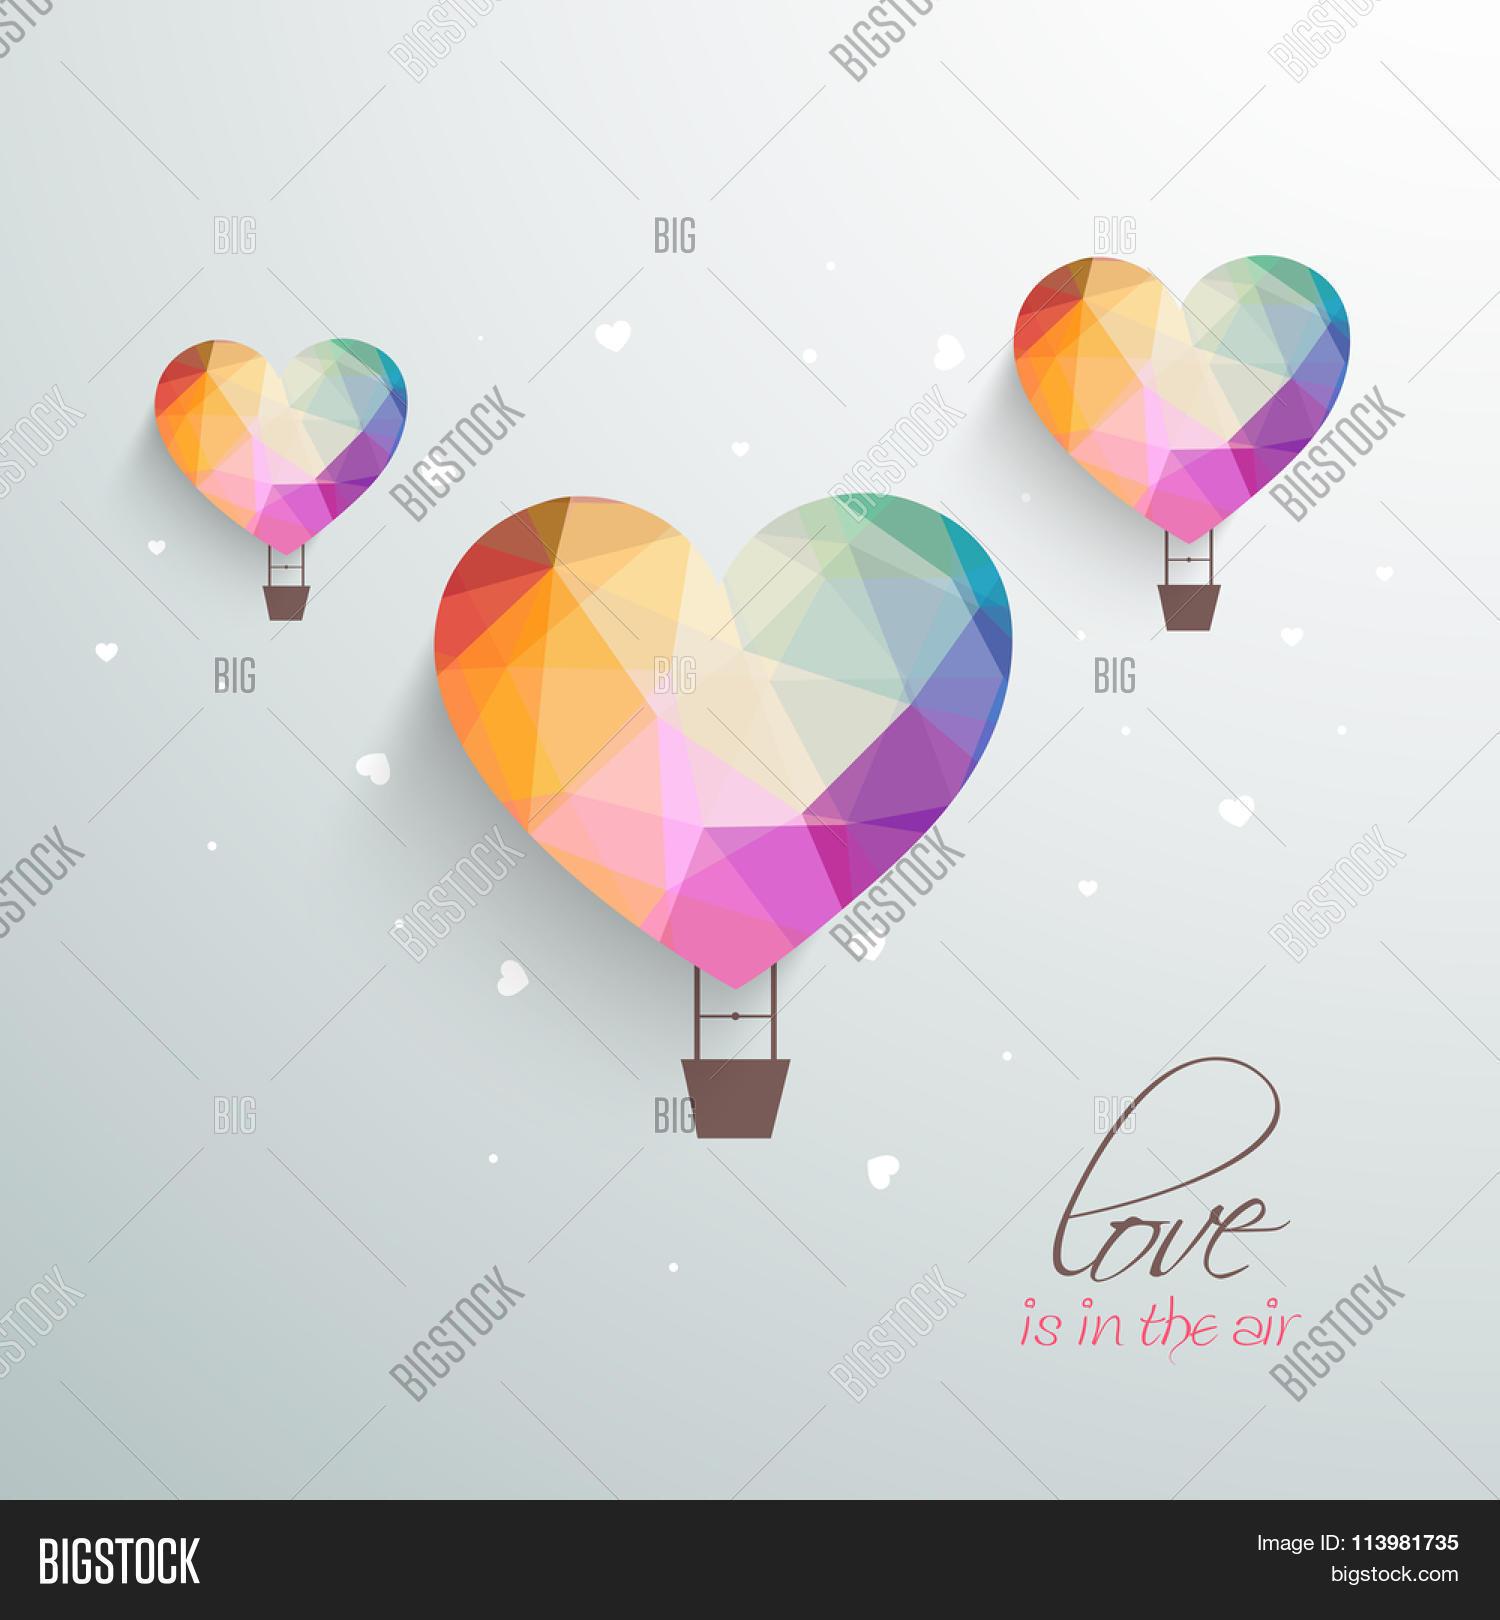 Love air creative hot air vector photo bigstock love is in the air creative hot air balloons in colorful origami heart shape for jeuxipadfo Choice Image